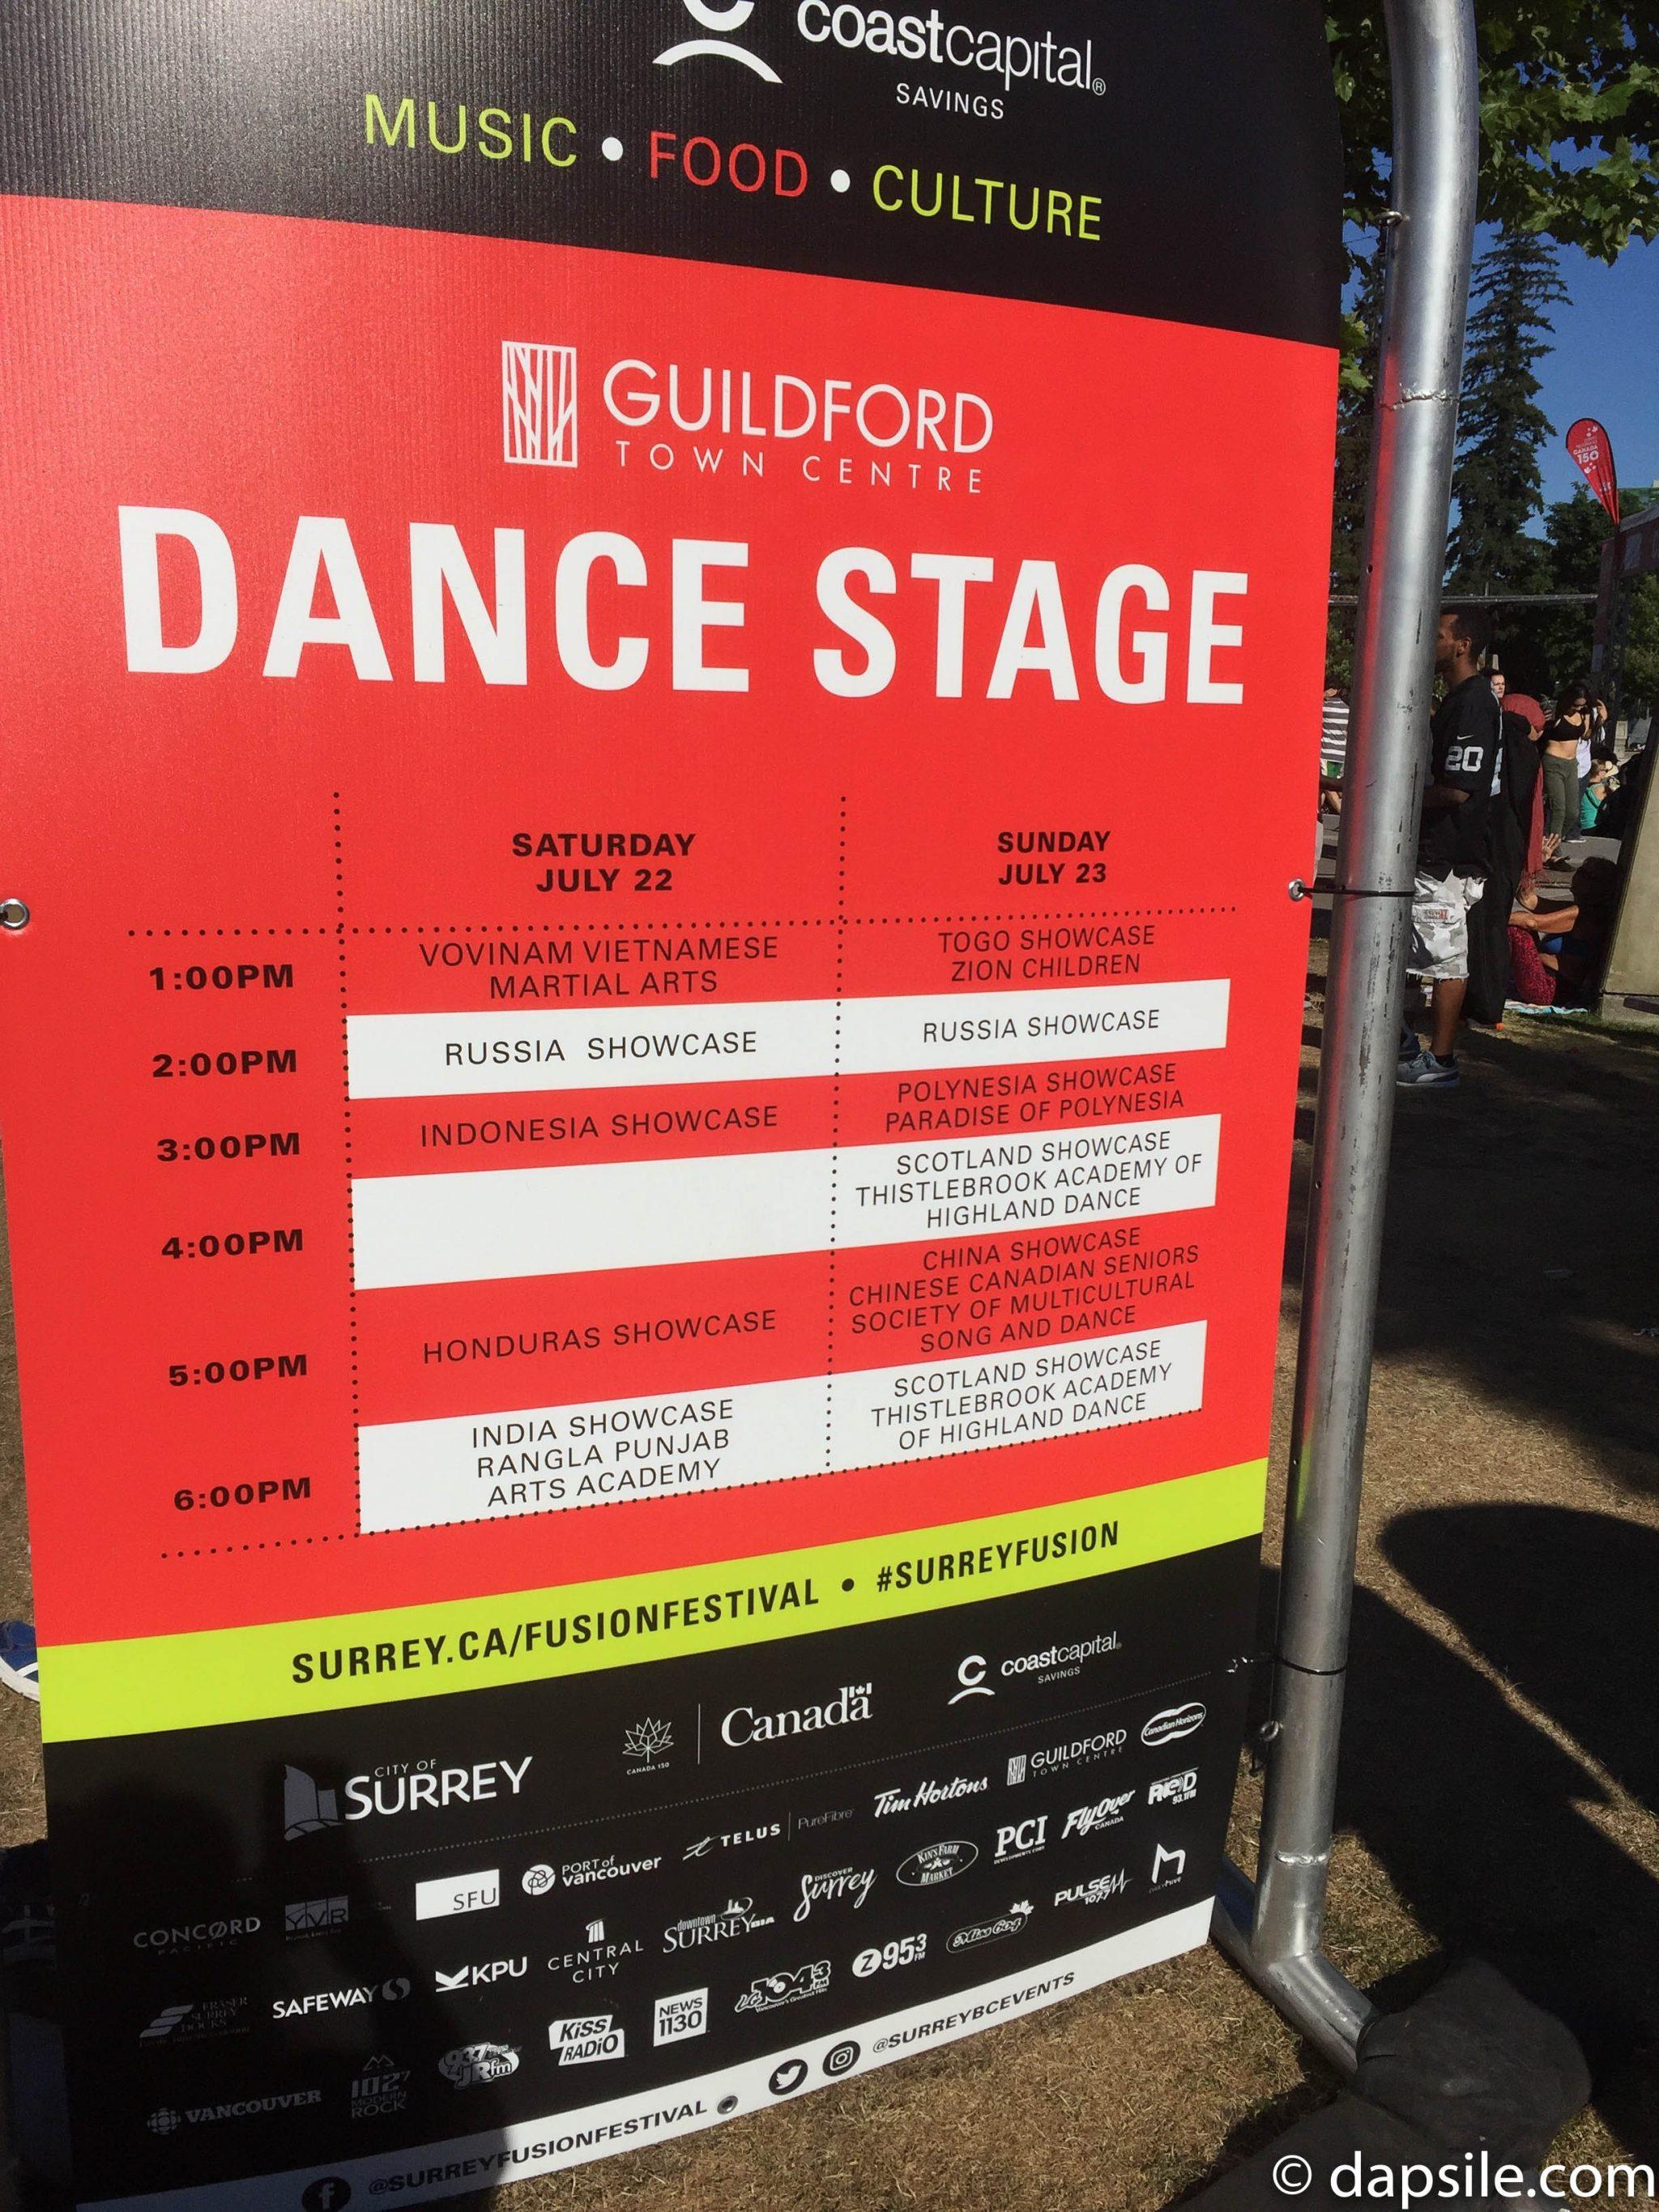 Surrey Fusion Festival 2017 Dance Stage Schedule